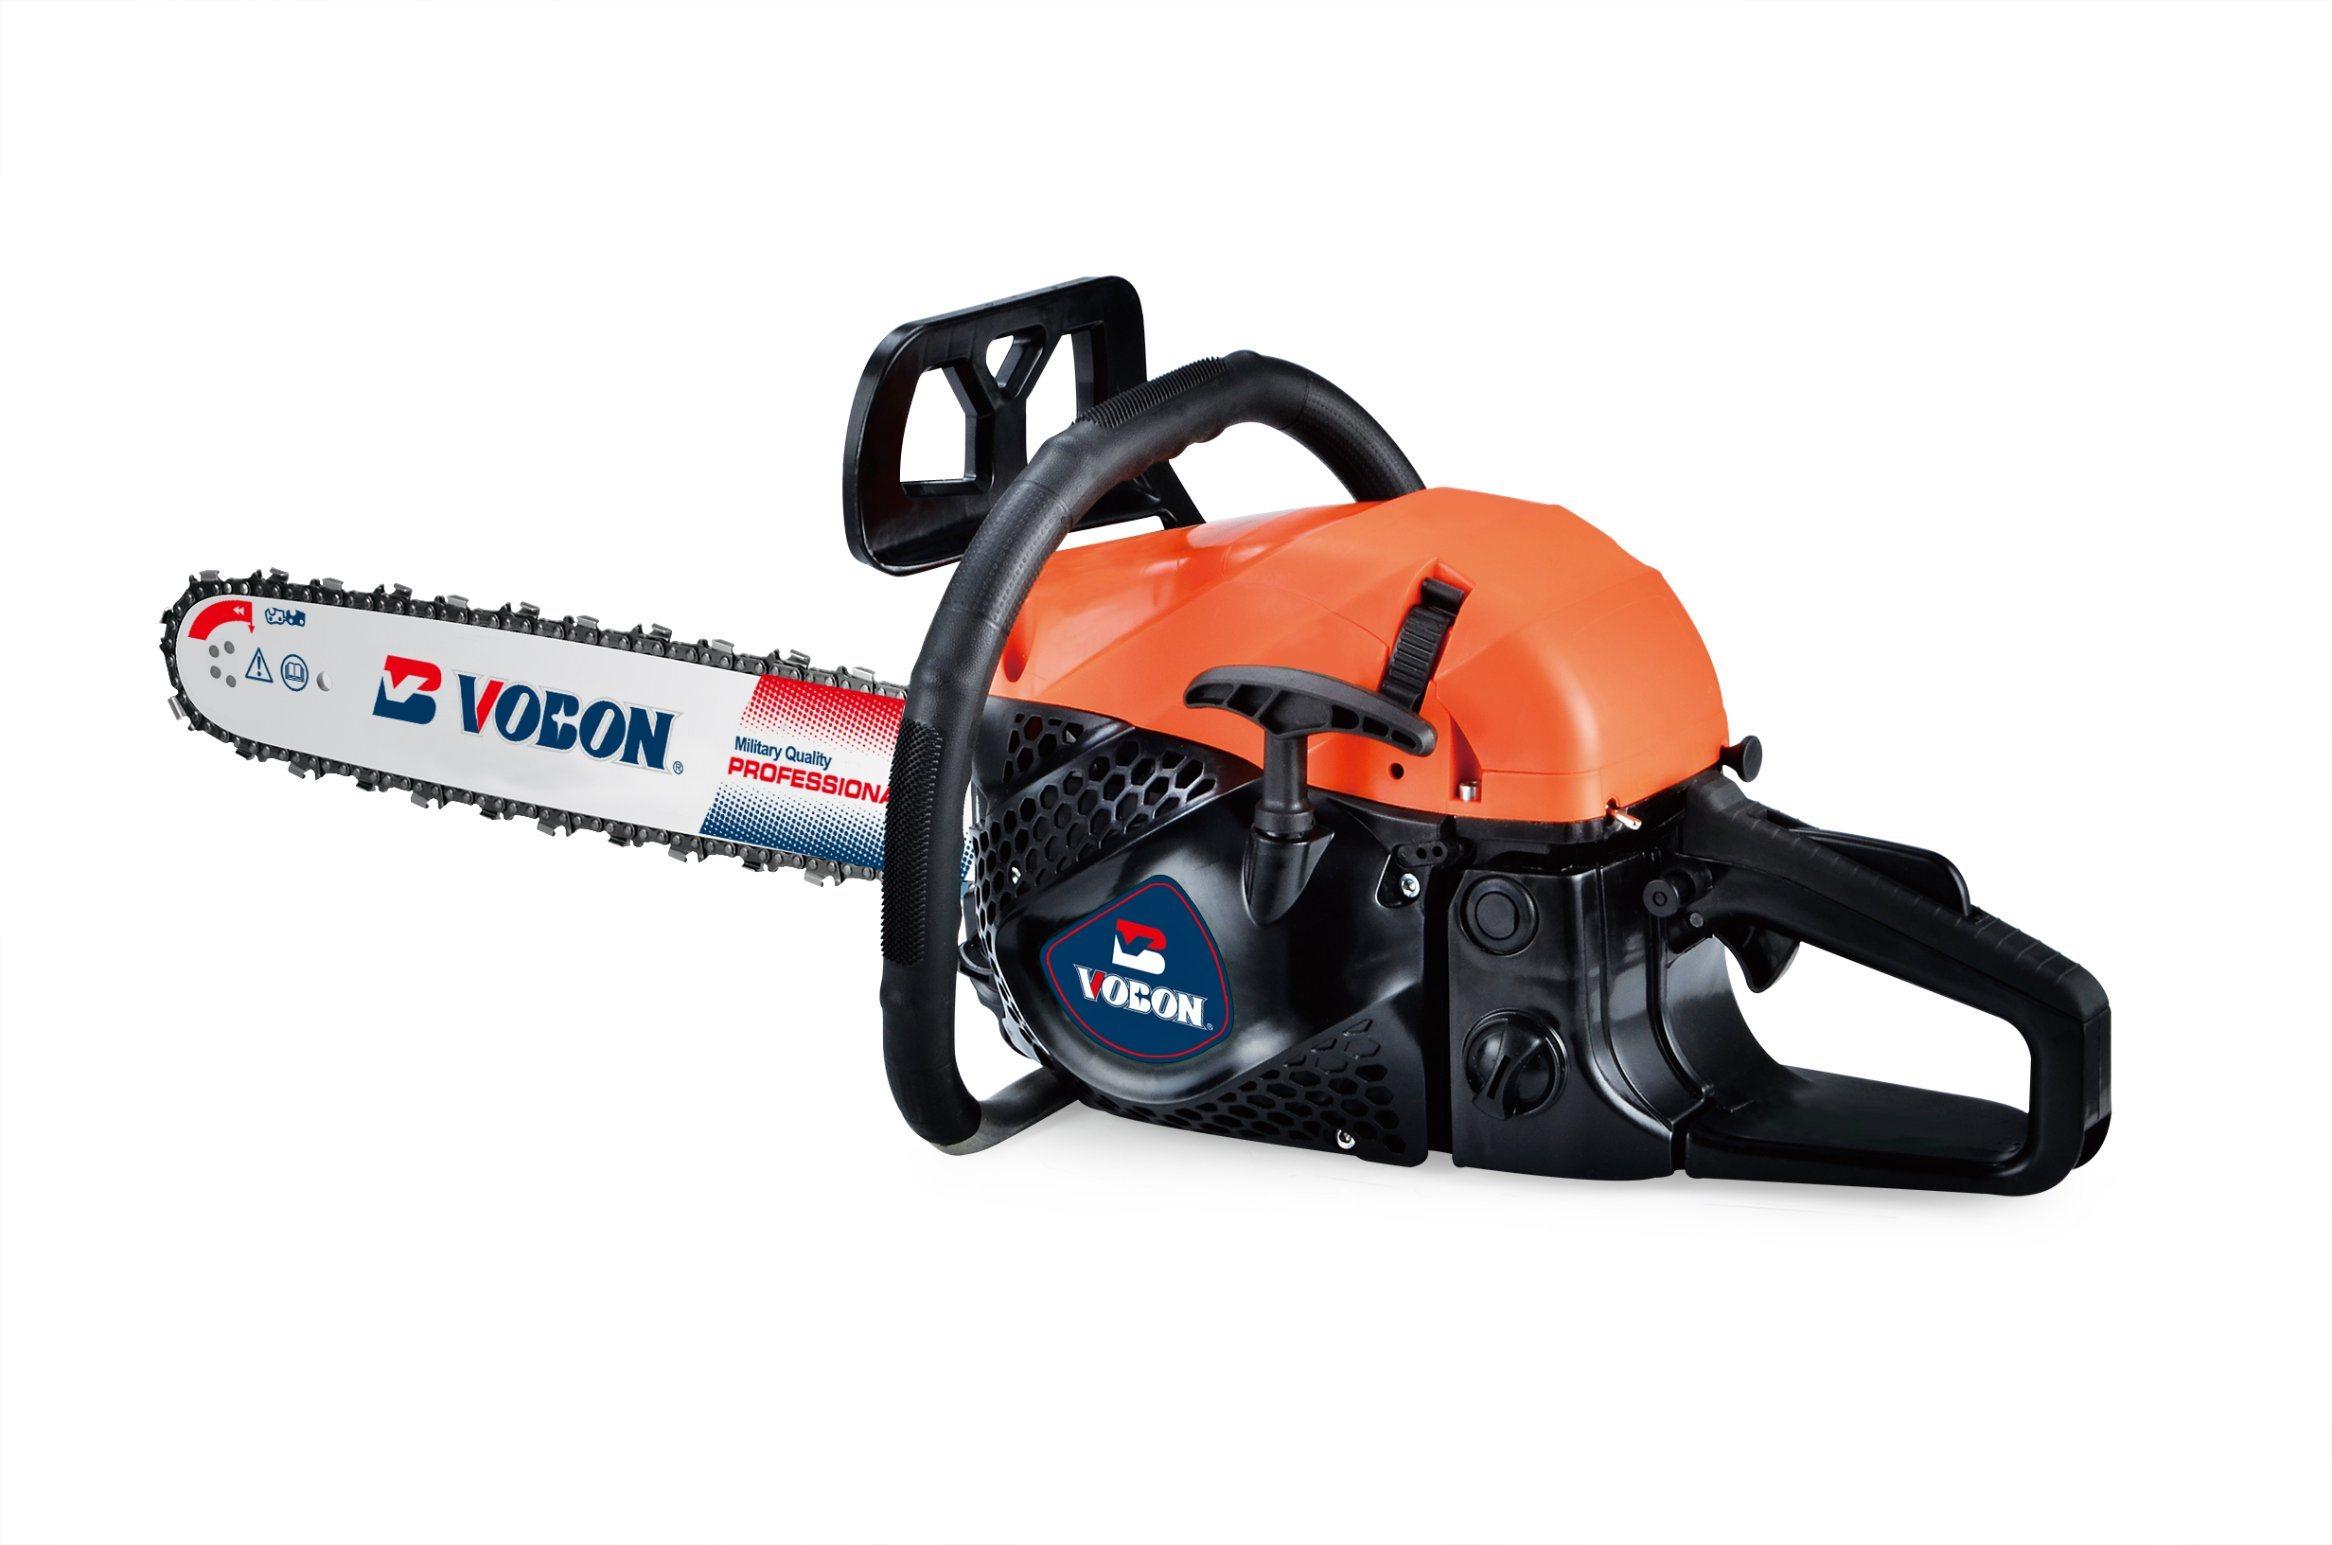 52cc Chain Saw Professional Gasoline Chain Saw